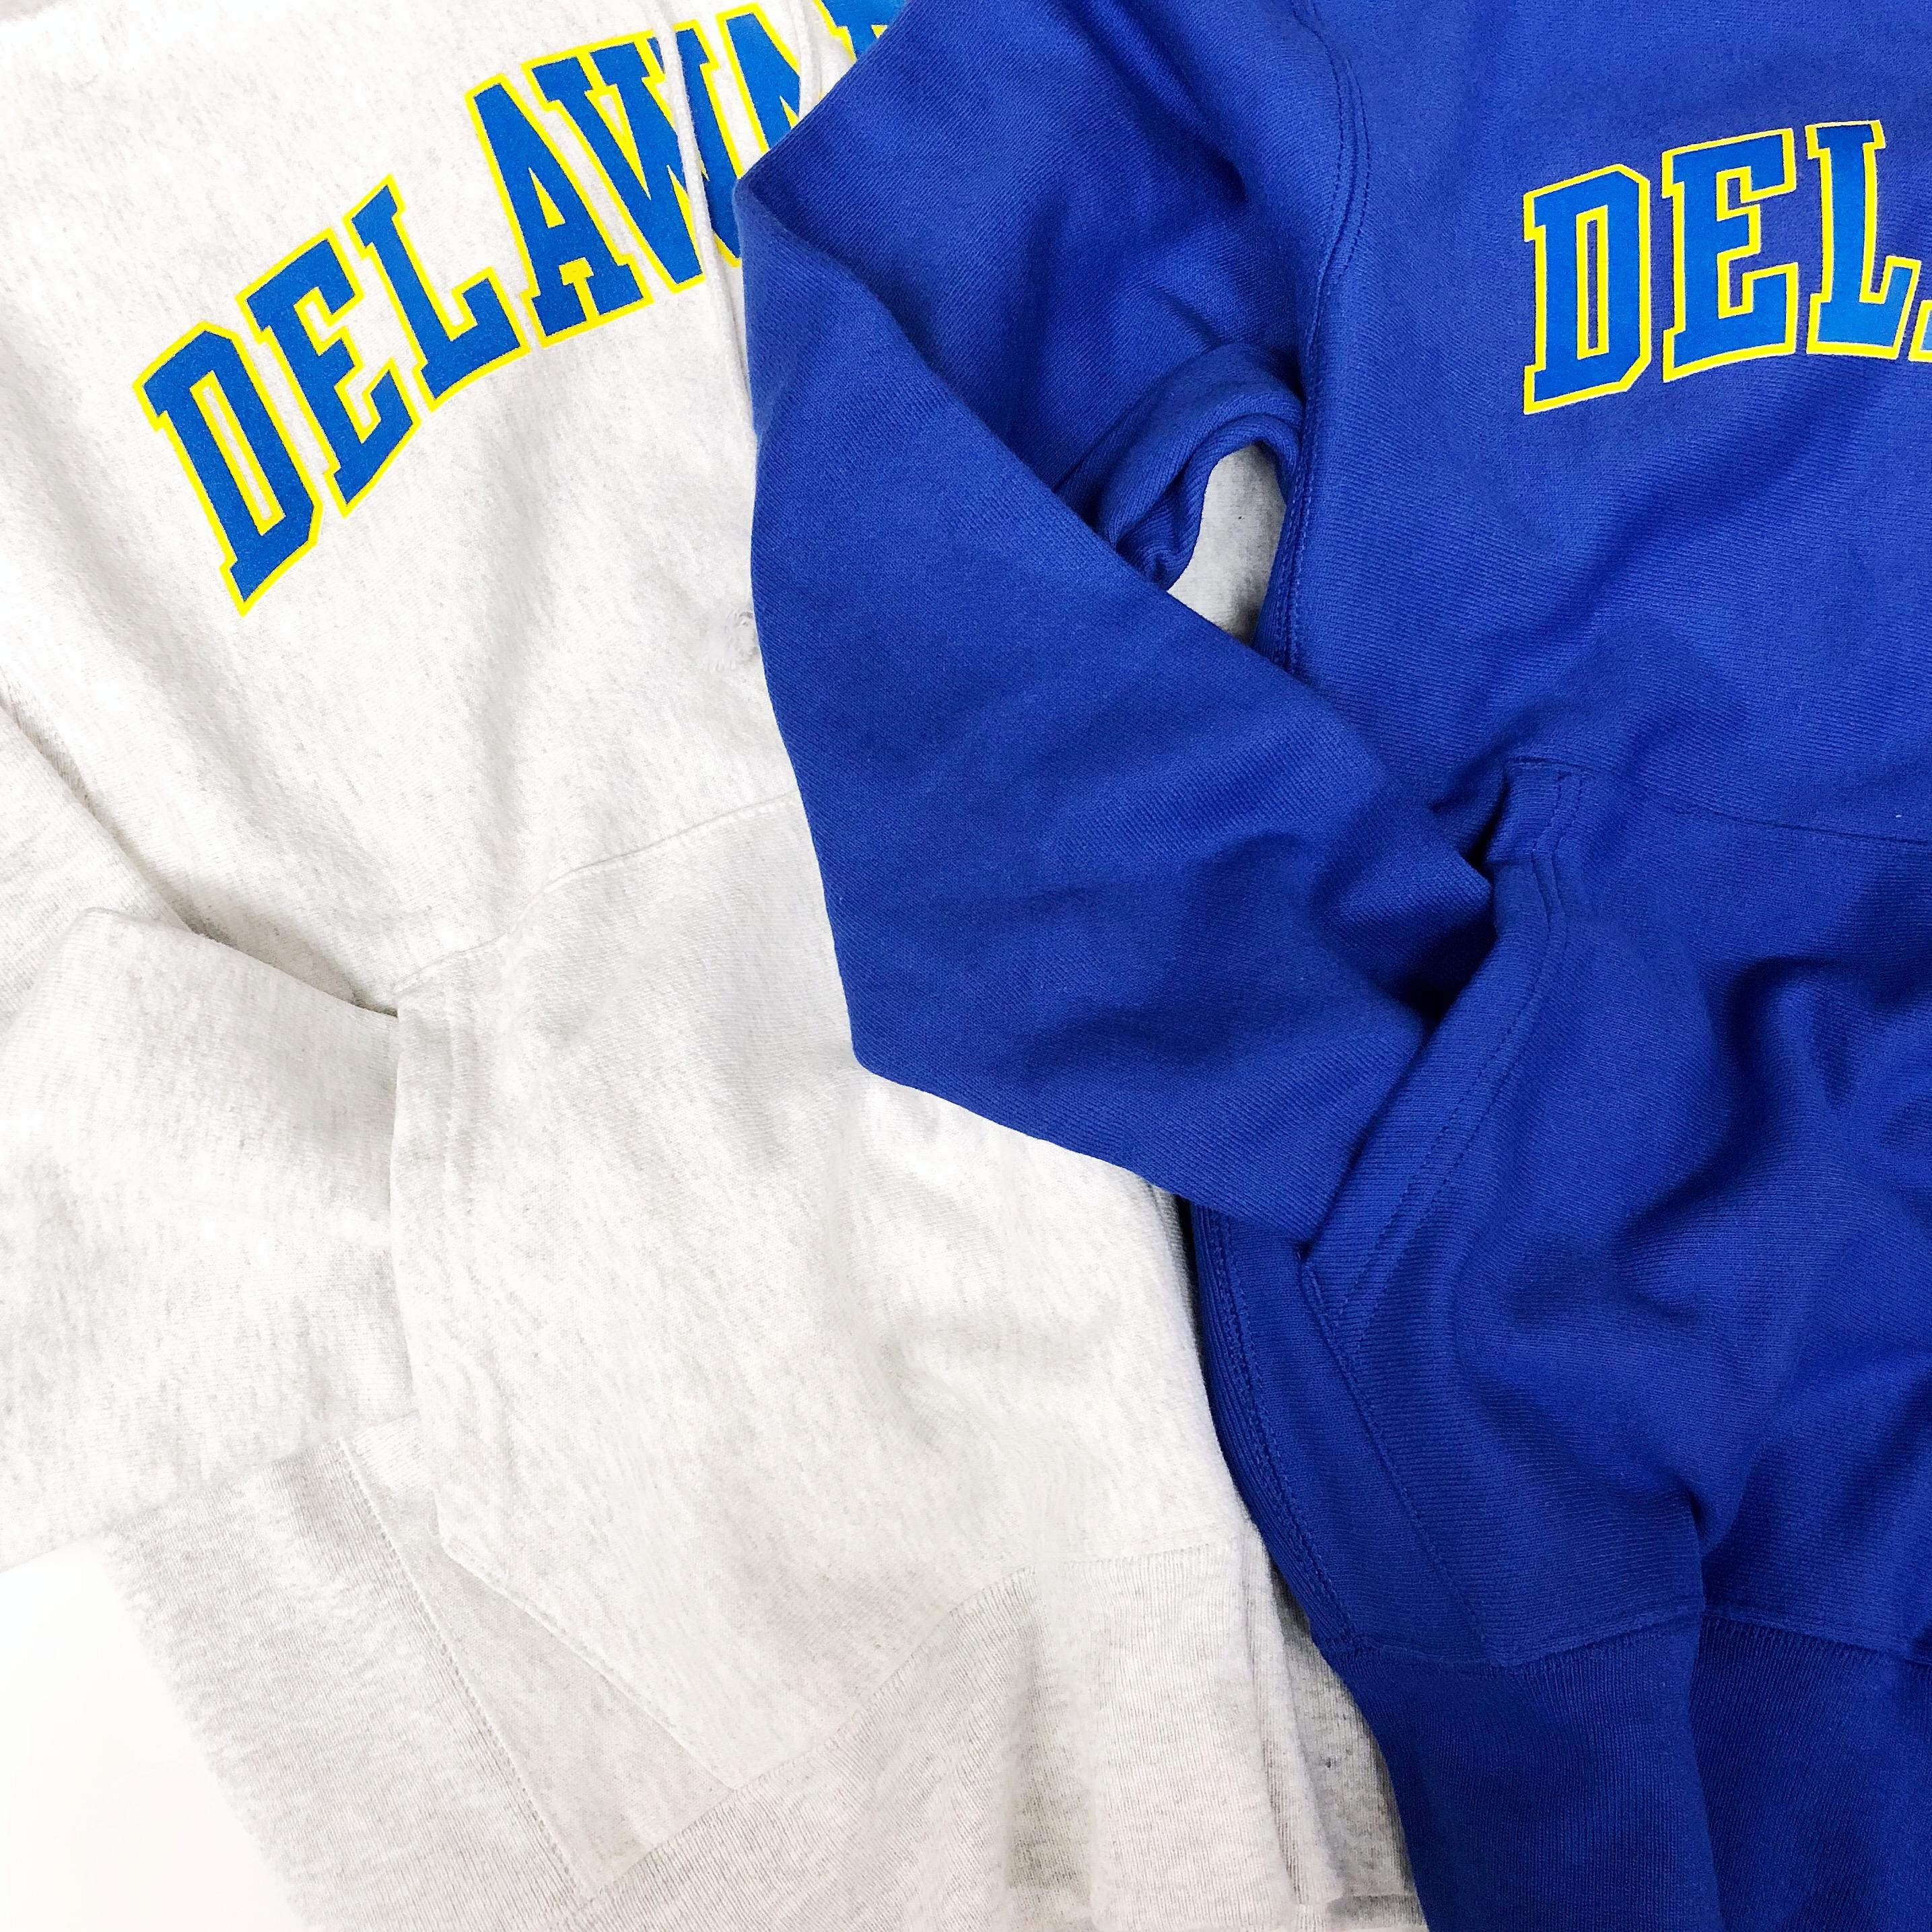 4cdddd7d University of Delaware Champion Reverse Weave Hoodie Sweatshirt ...